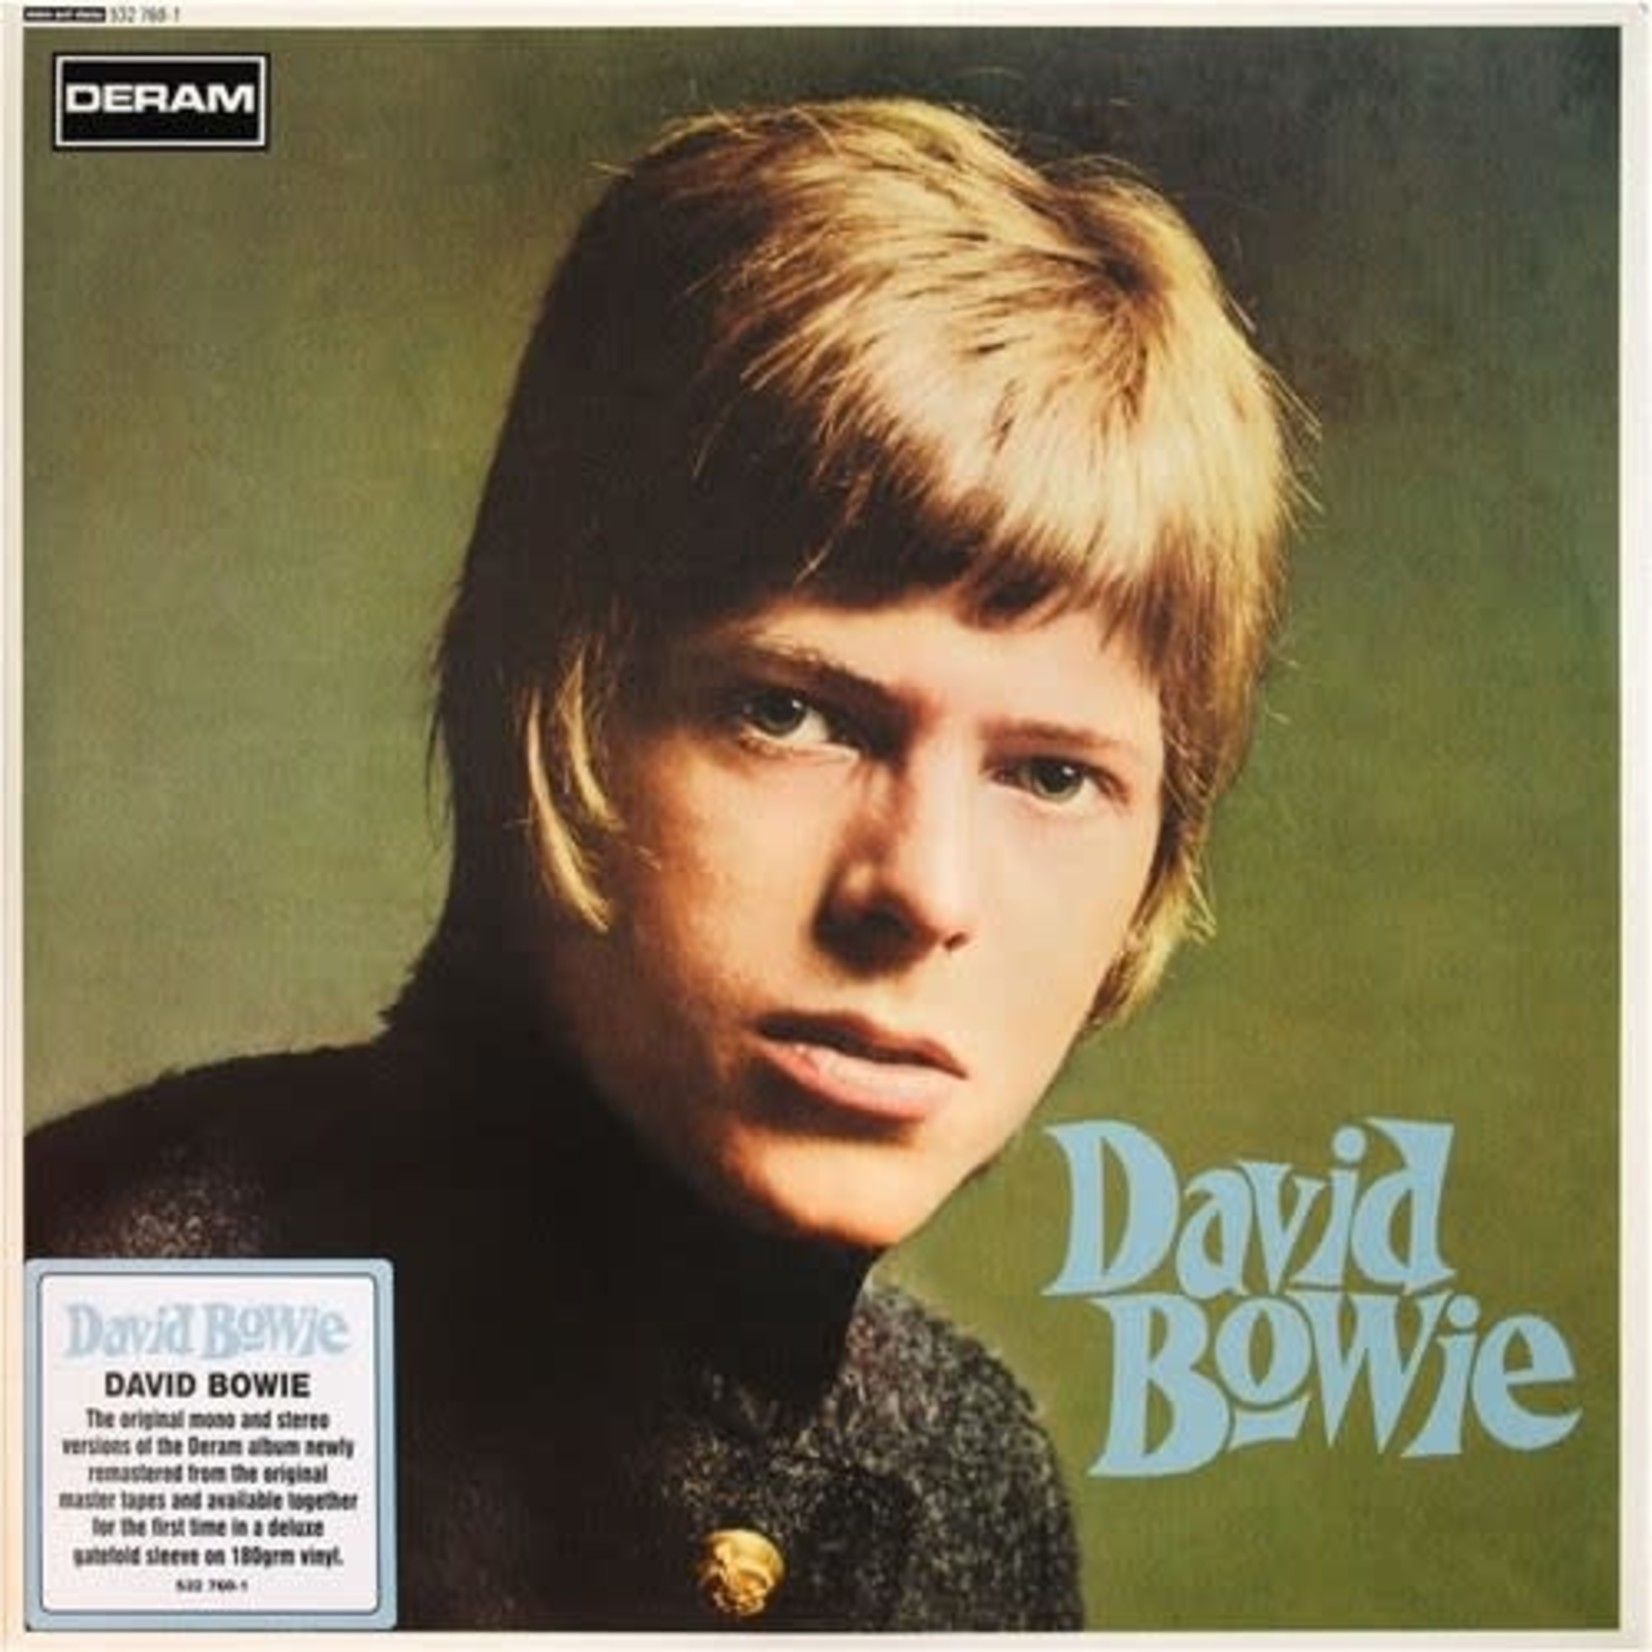 DAVID BOWIE - DAVID BOWIE  2LP